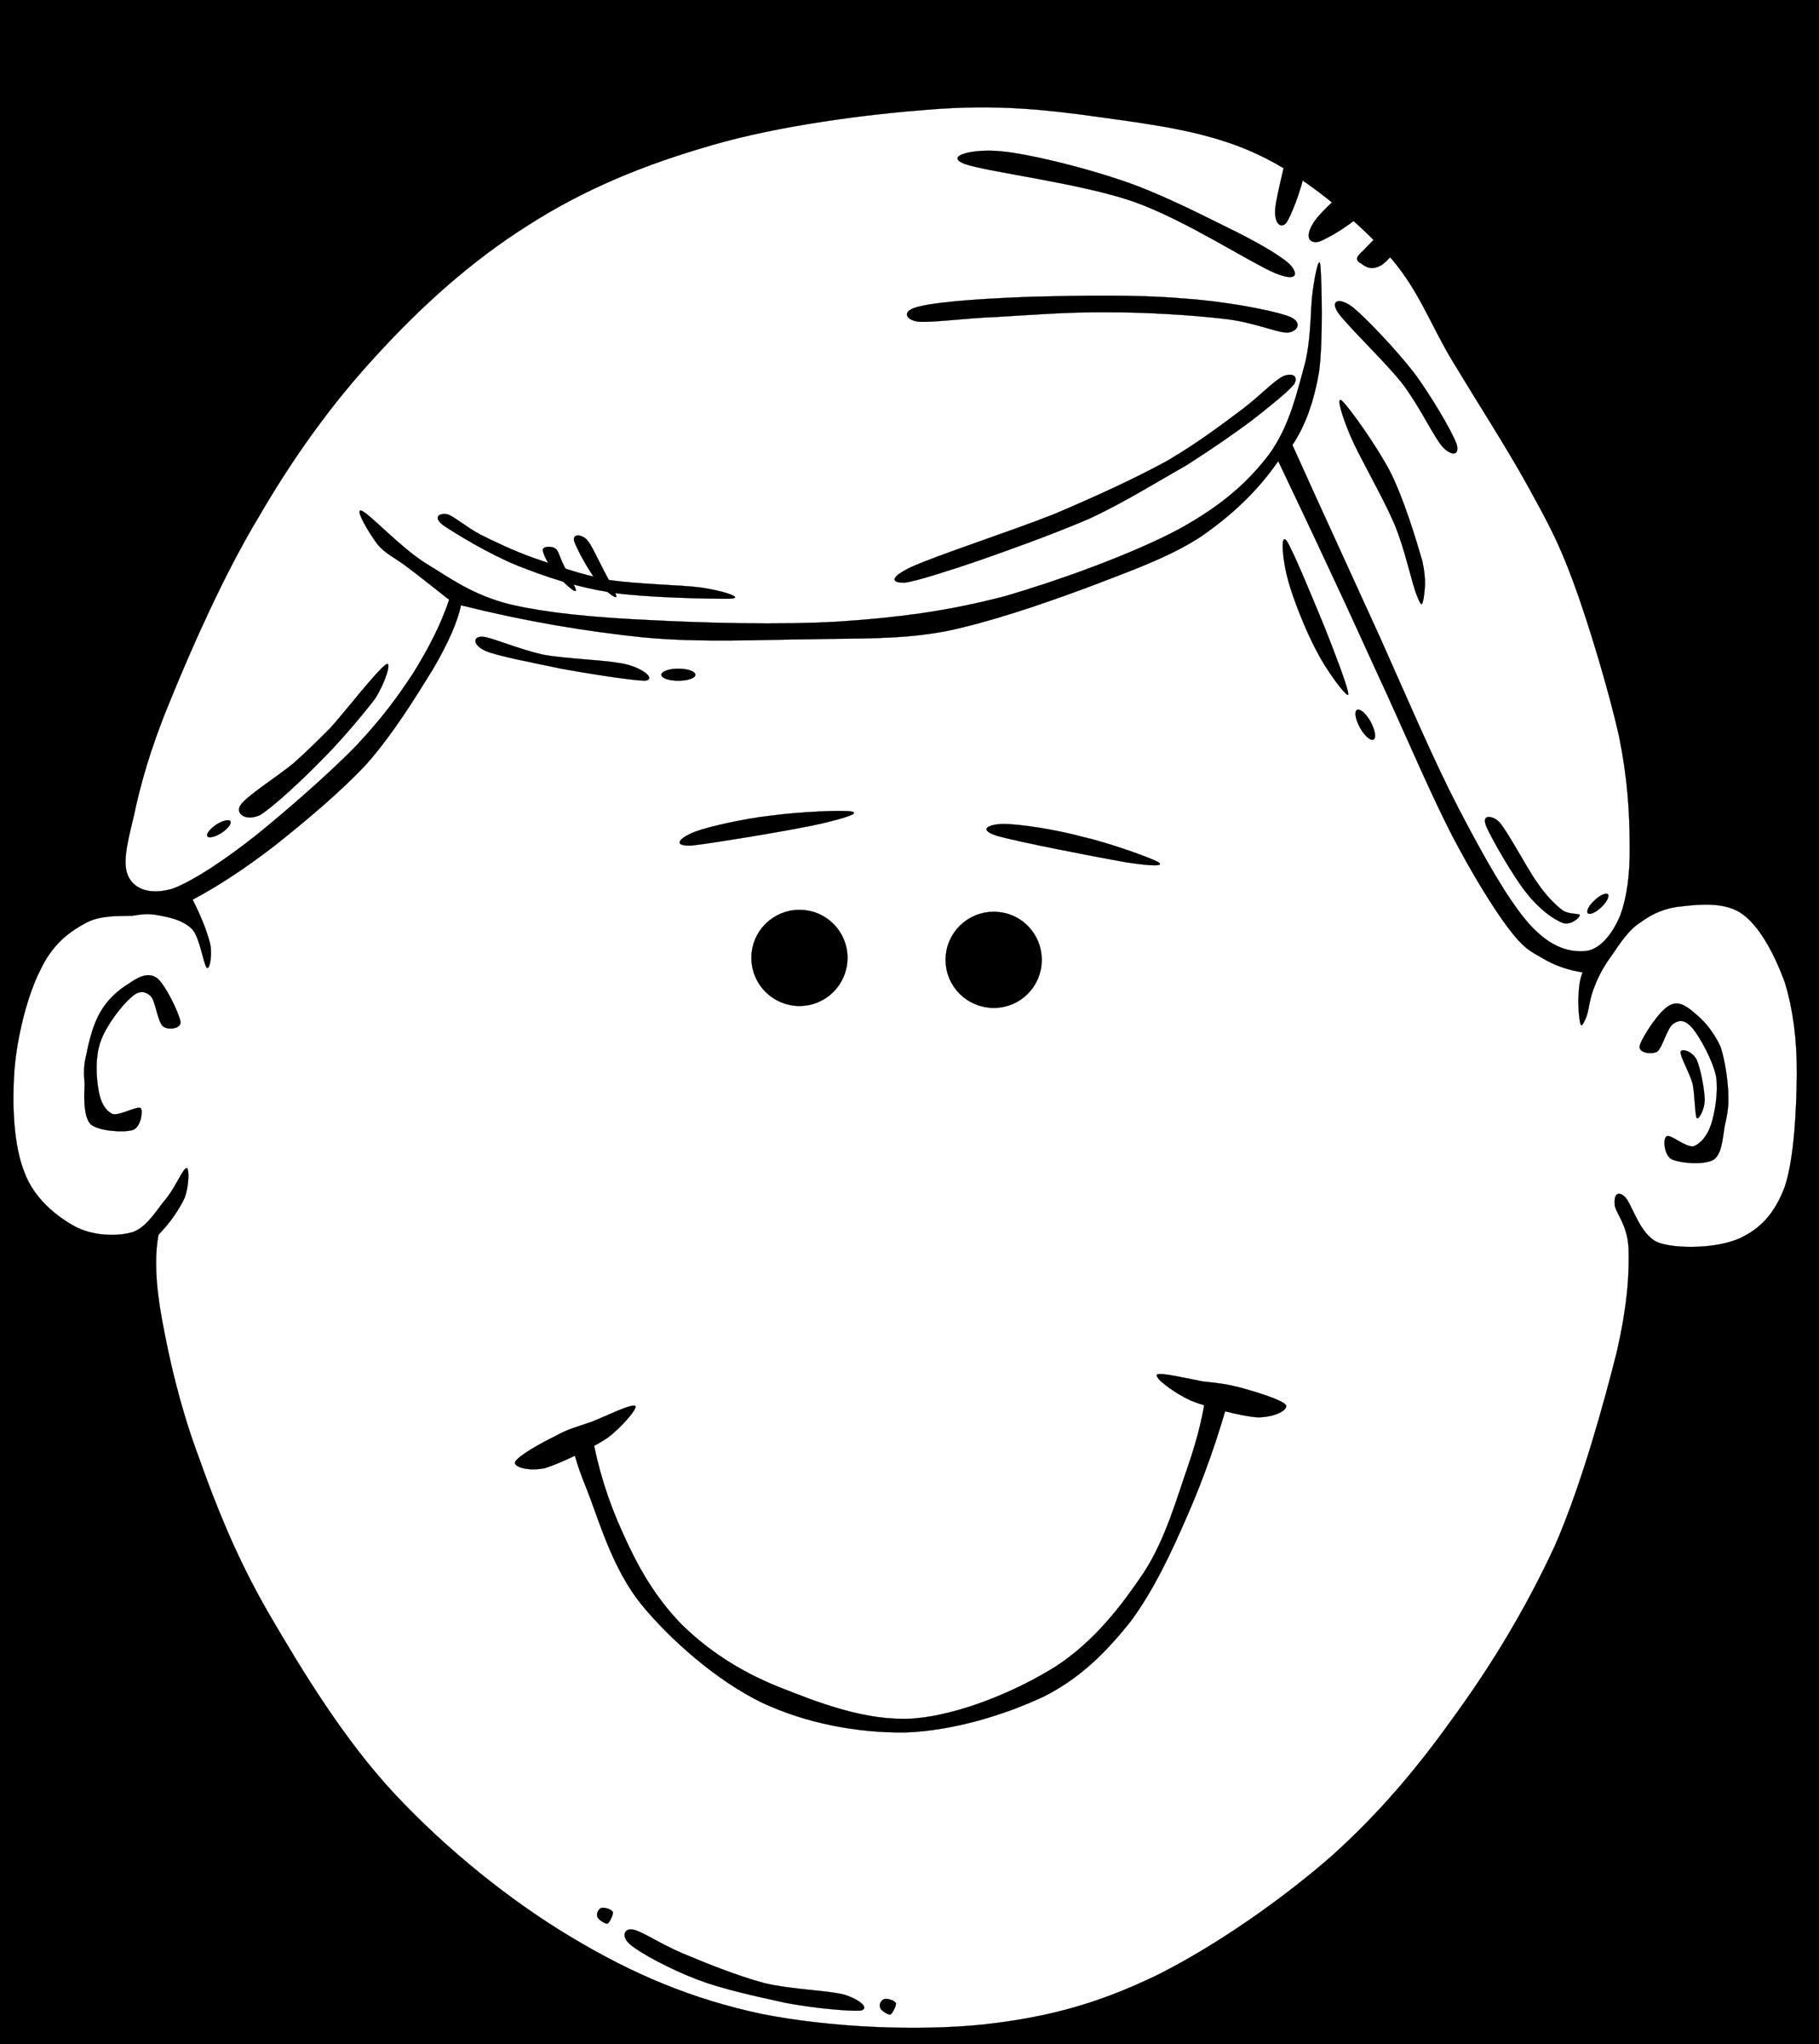 Faces clipart basic emotion, Faces basic emotion Transparent.